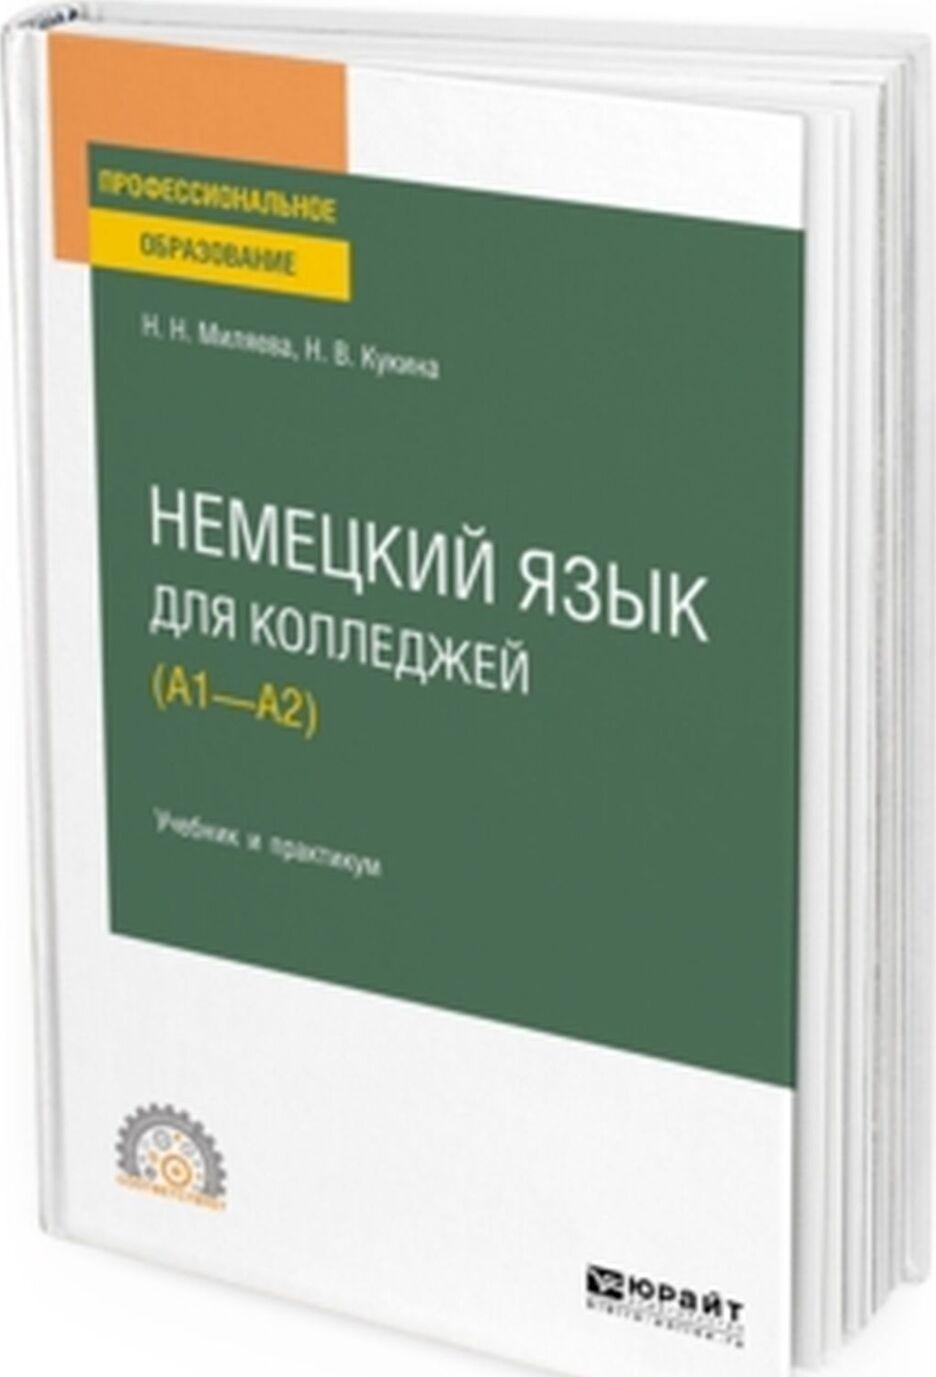 Nemetskij jazyk dlja kolledzhej (A1—A2). Uchebnik i praktikum  | Miljaeva Natalija Nikolaevna, Kukina Natalja Vladimirovna